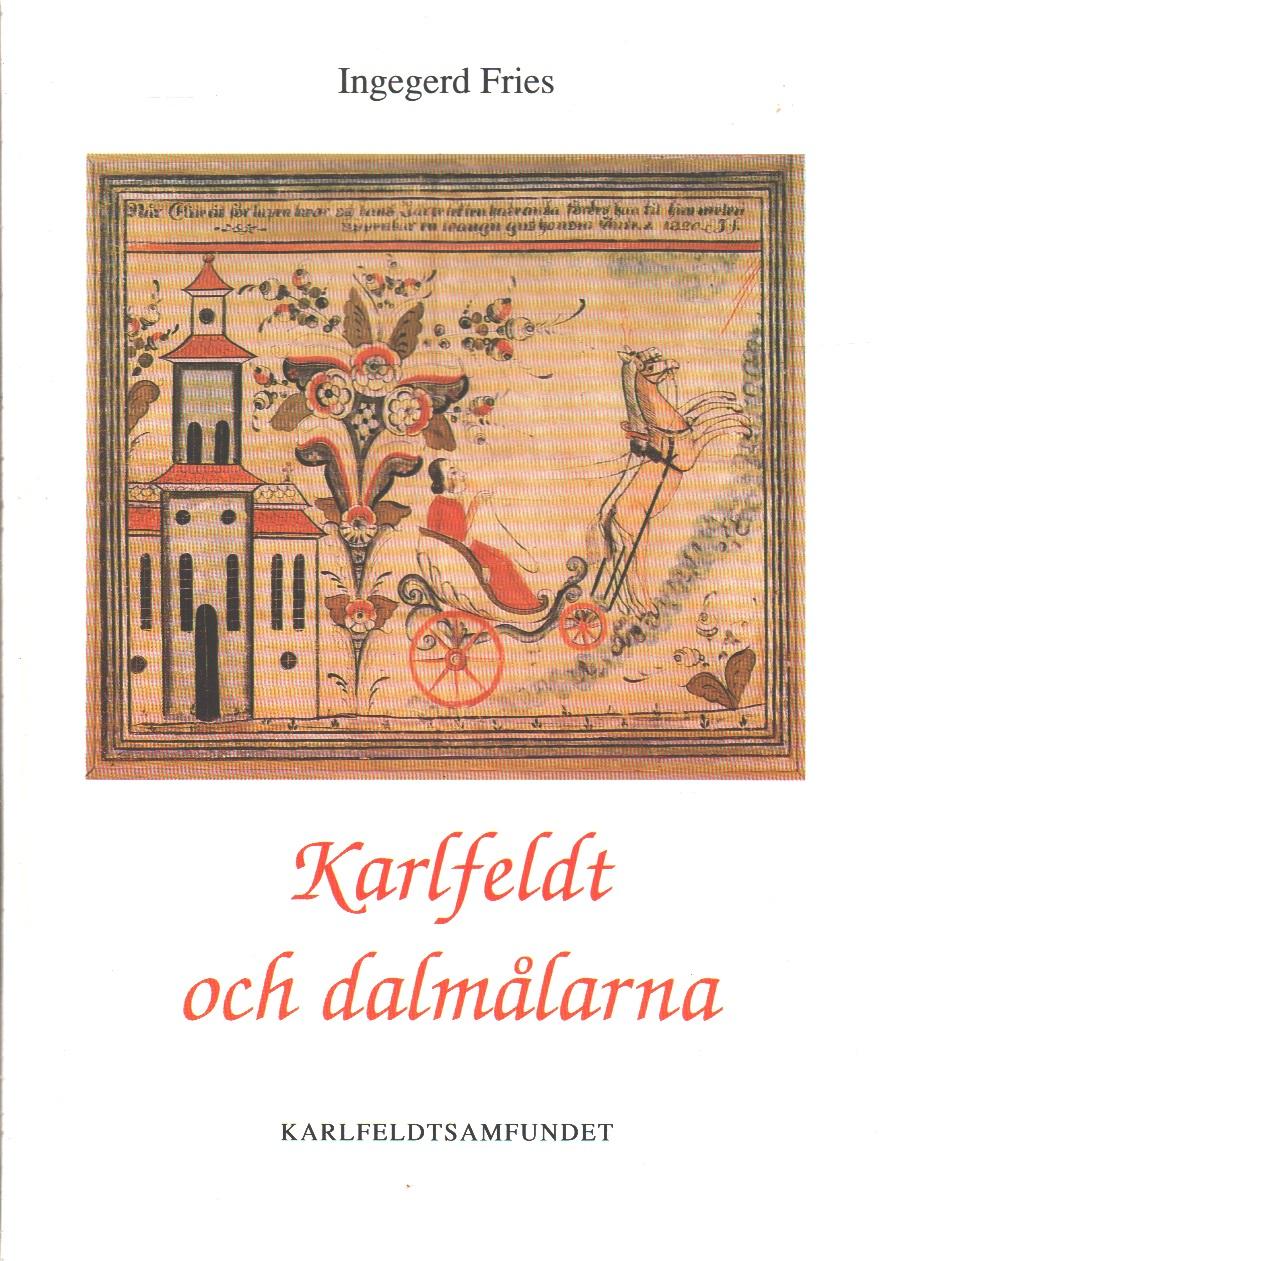 Karlfeldt och dalmålarna - Fries, Ingegerd